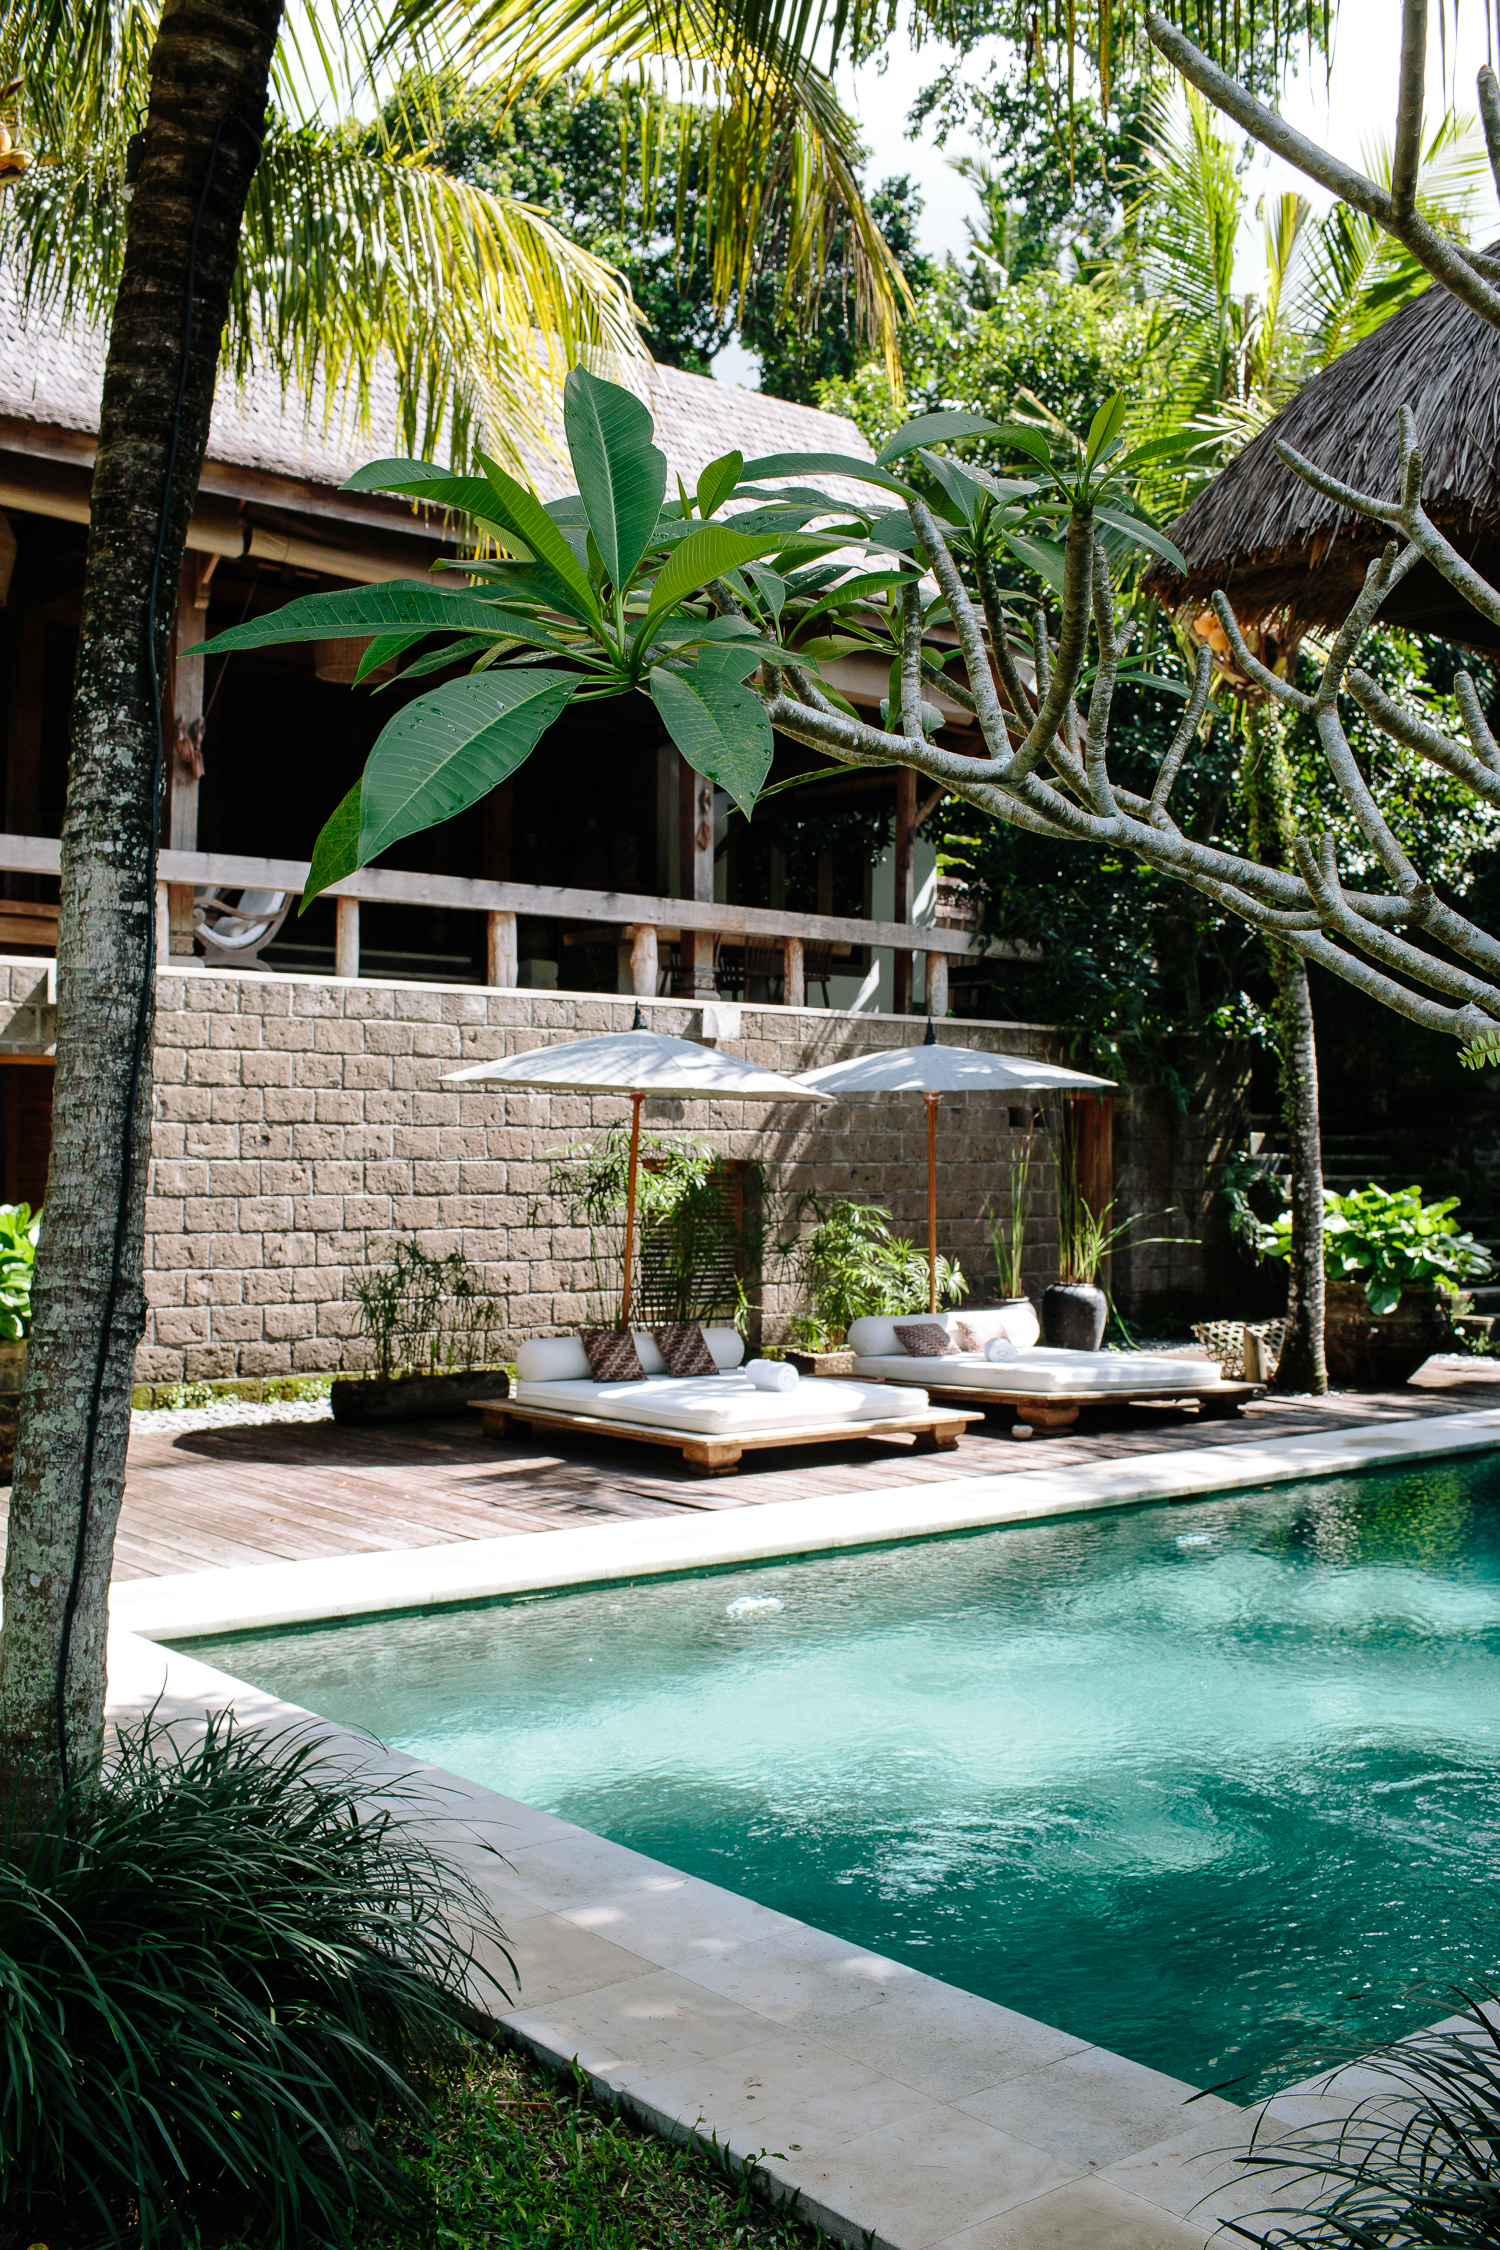 Bali-Kalapa-2016-4970.jpg